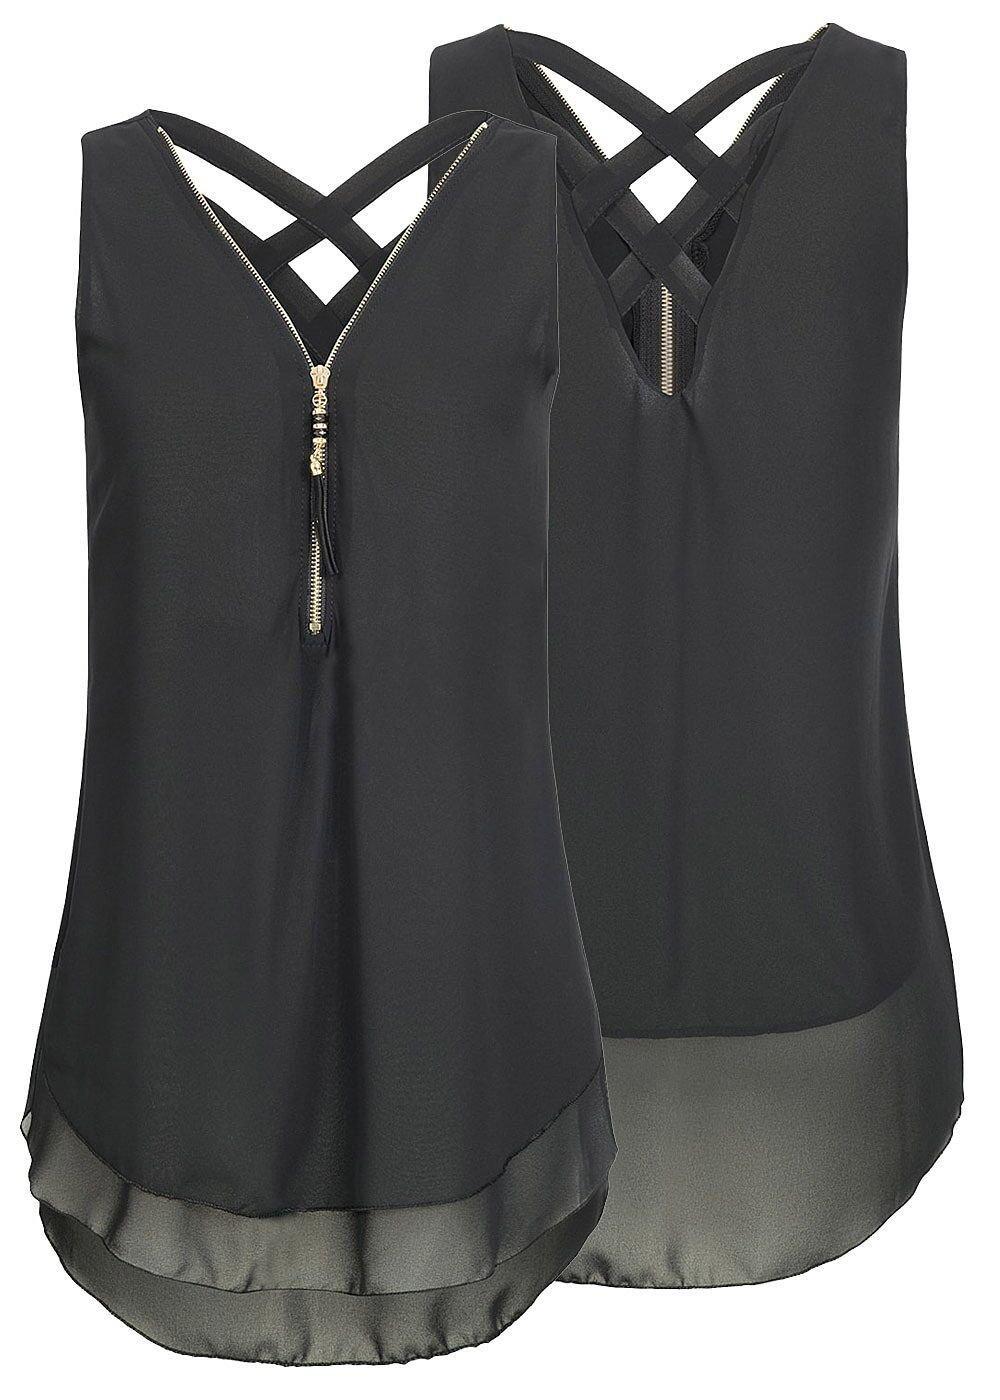 Yknktstc Womens Casual Sleeveless V Neck Chiffon Tank Top Crisscross Back Zipper Blouse T Shirt XX-Large Style 2-Black